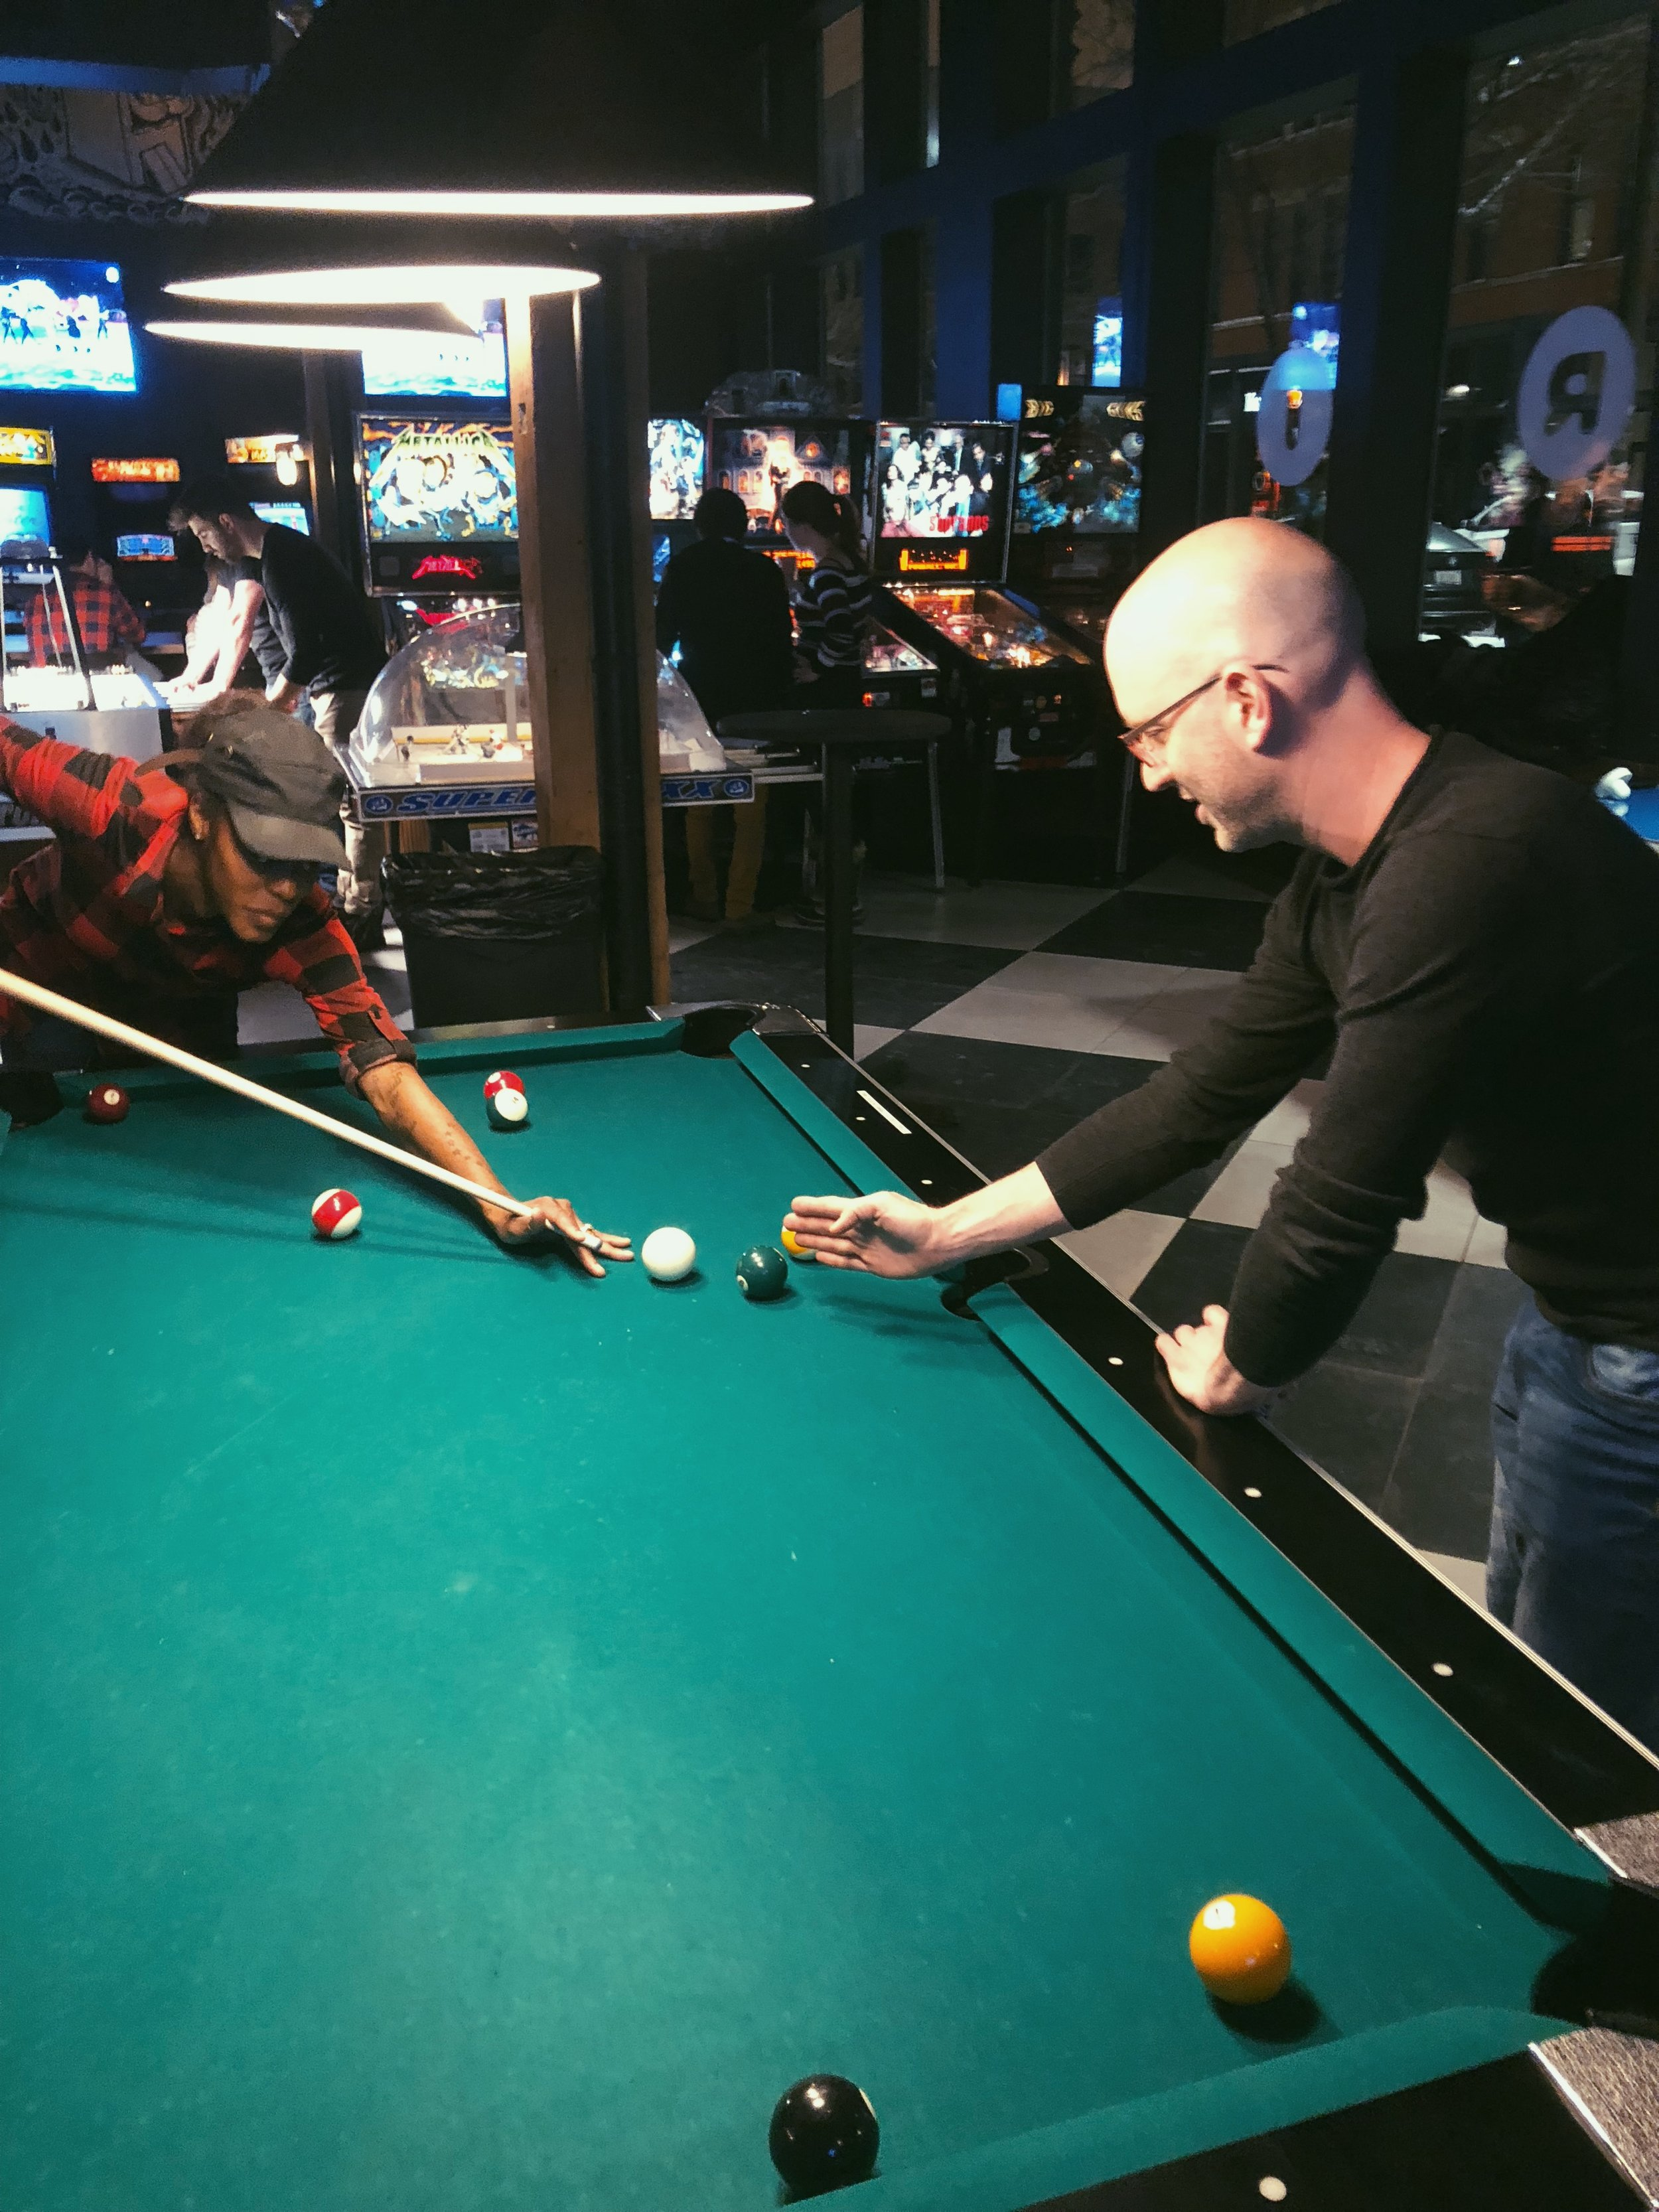 Shawn giving Shay pro tips at pool.